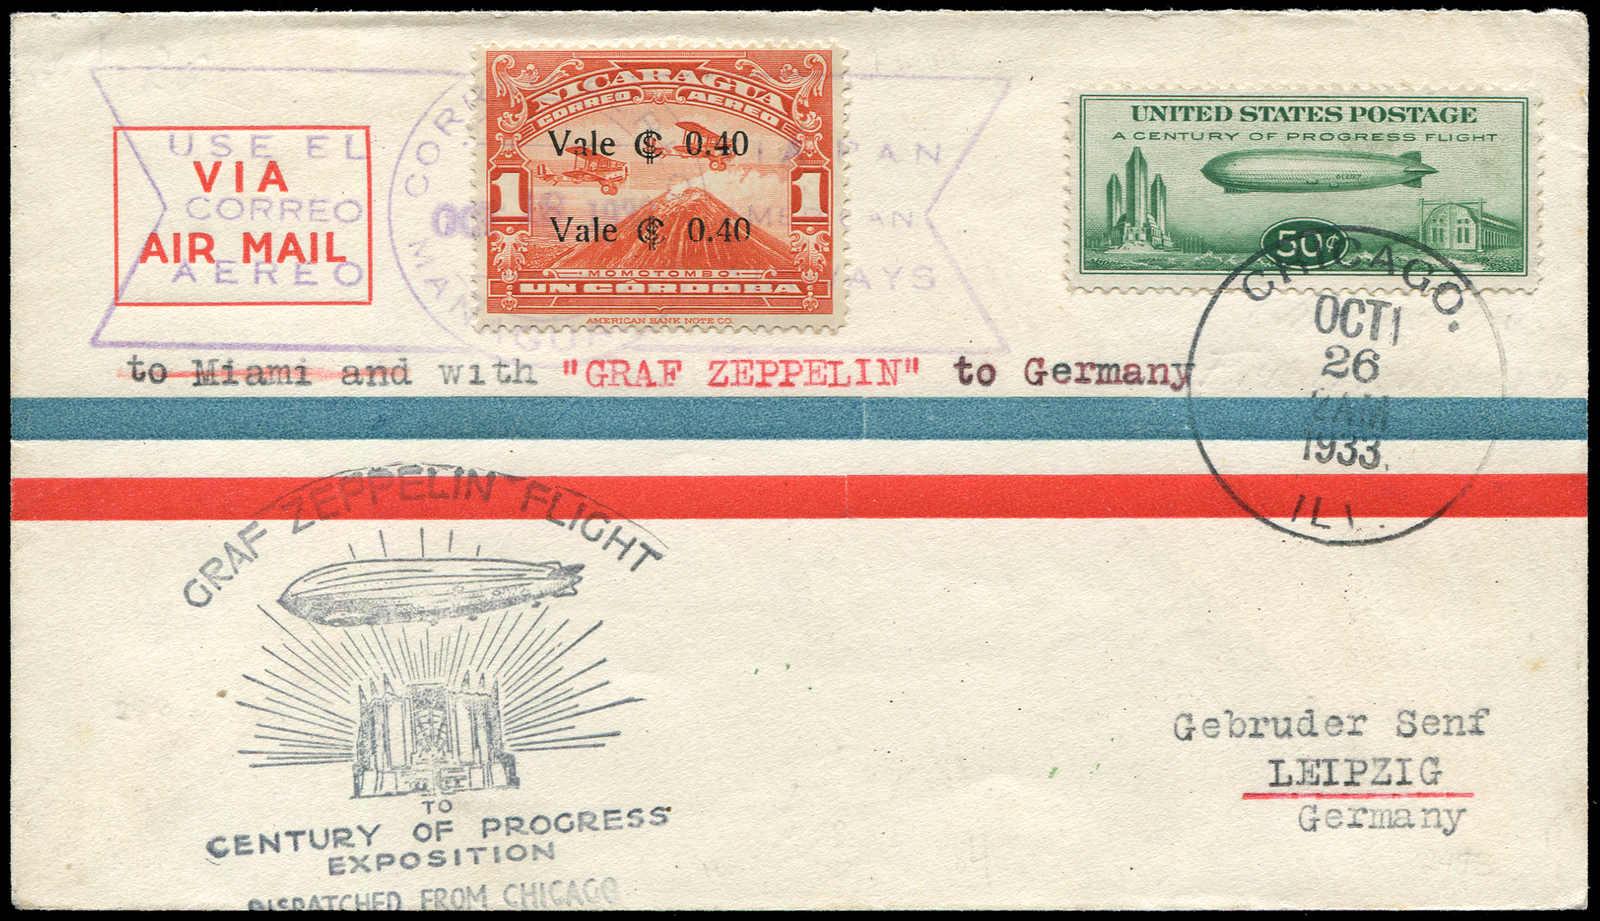 Lot 9137 - Zeppelin/Air Mail Zeppelin, Zeppelinpost LZ 127, Chicagofahrt -  Auktionshaus Schlegel 26 Public Auction